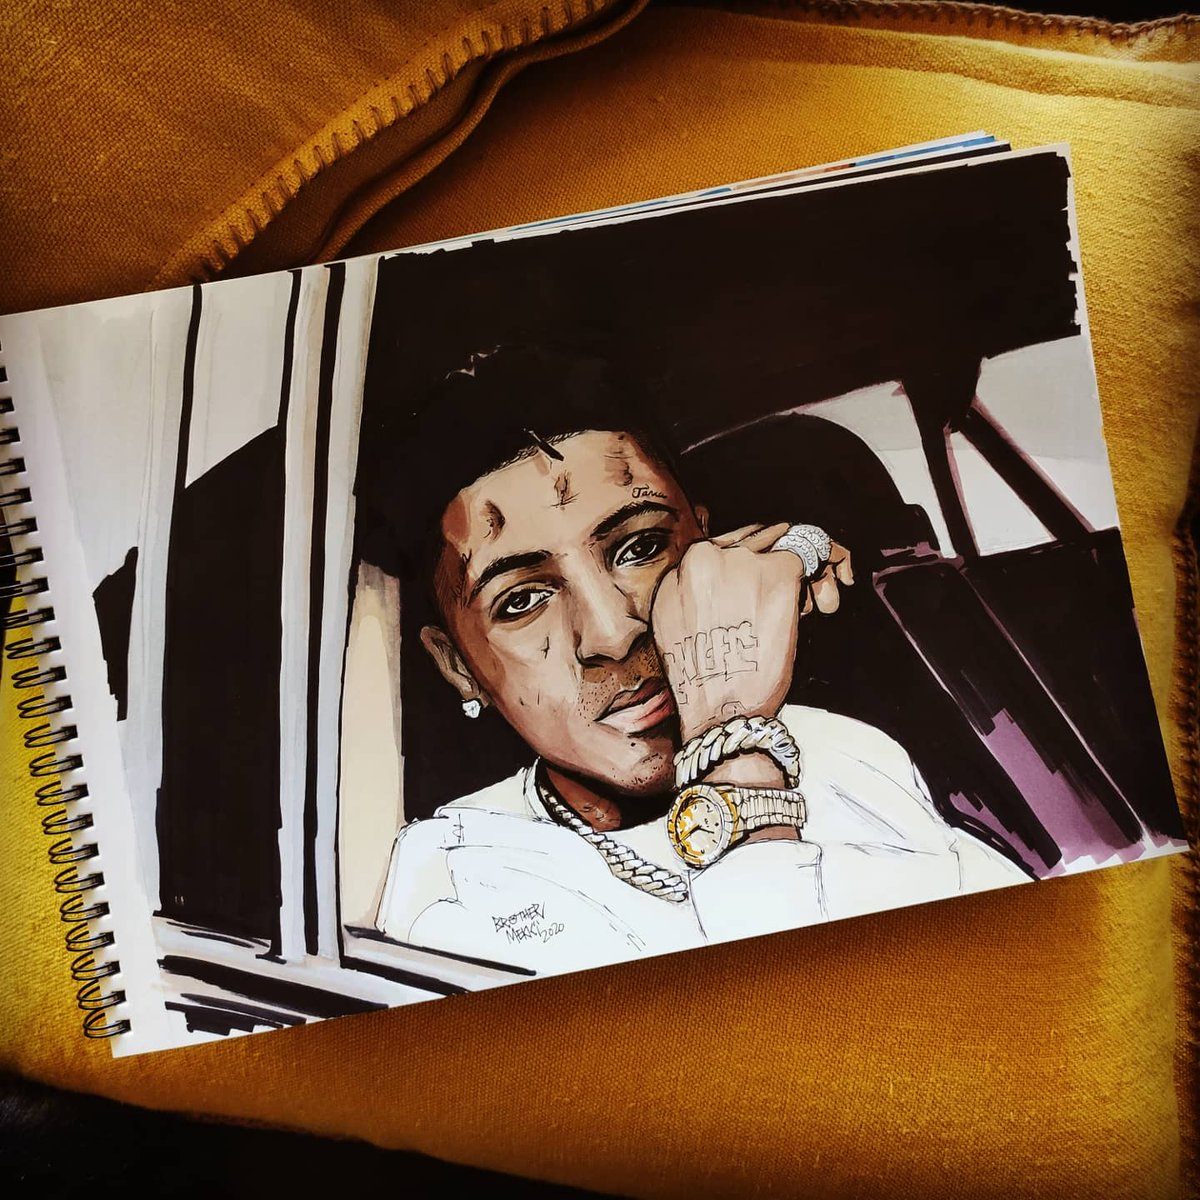 Youngboy Never Broke Again @GGYOUNGBOY  #youngboynba #nbayoungboy #batonrouge #louisiane #louisiana #nba #boosiebadazz #kevingates #illustrationoftheday #illustration #dessin #promarkers #winsorandnewton #rapmusic #38baby #untildeathcallmyname #outsidetodaypic.twitter.com/igJMncA4ad